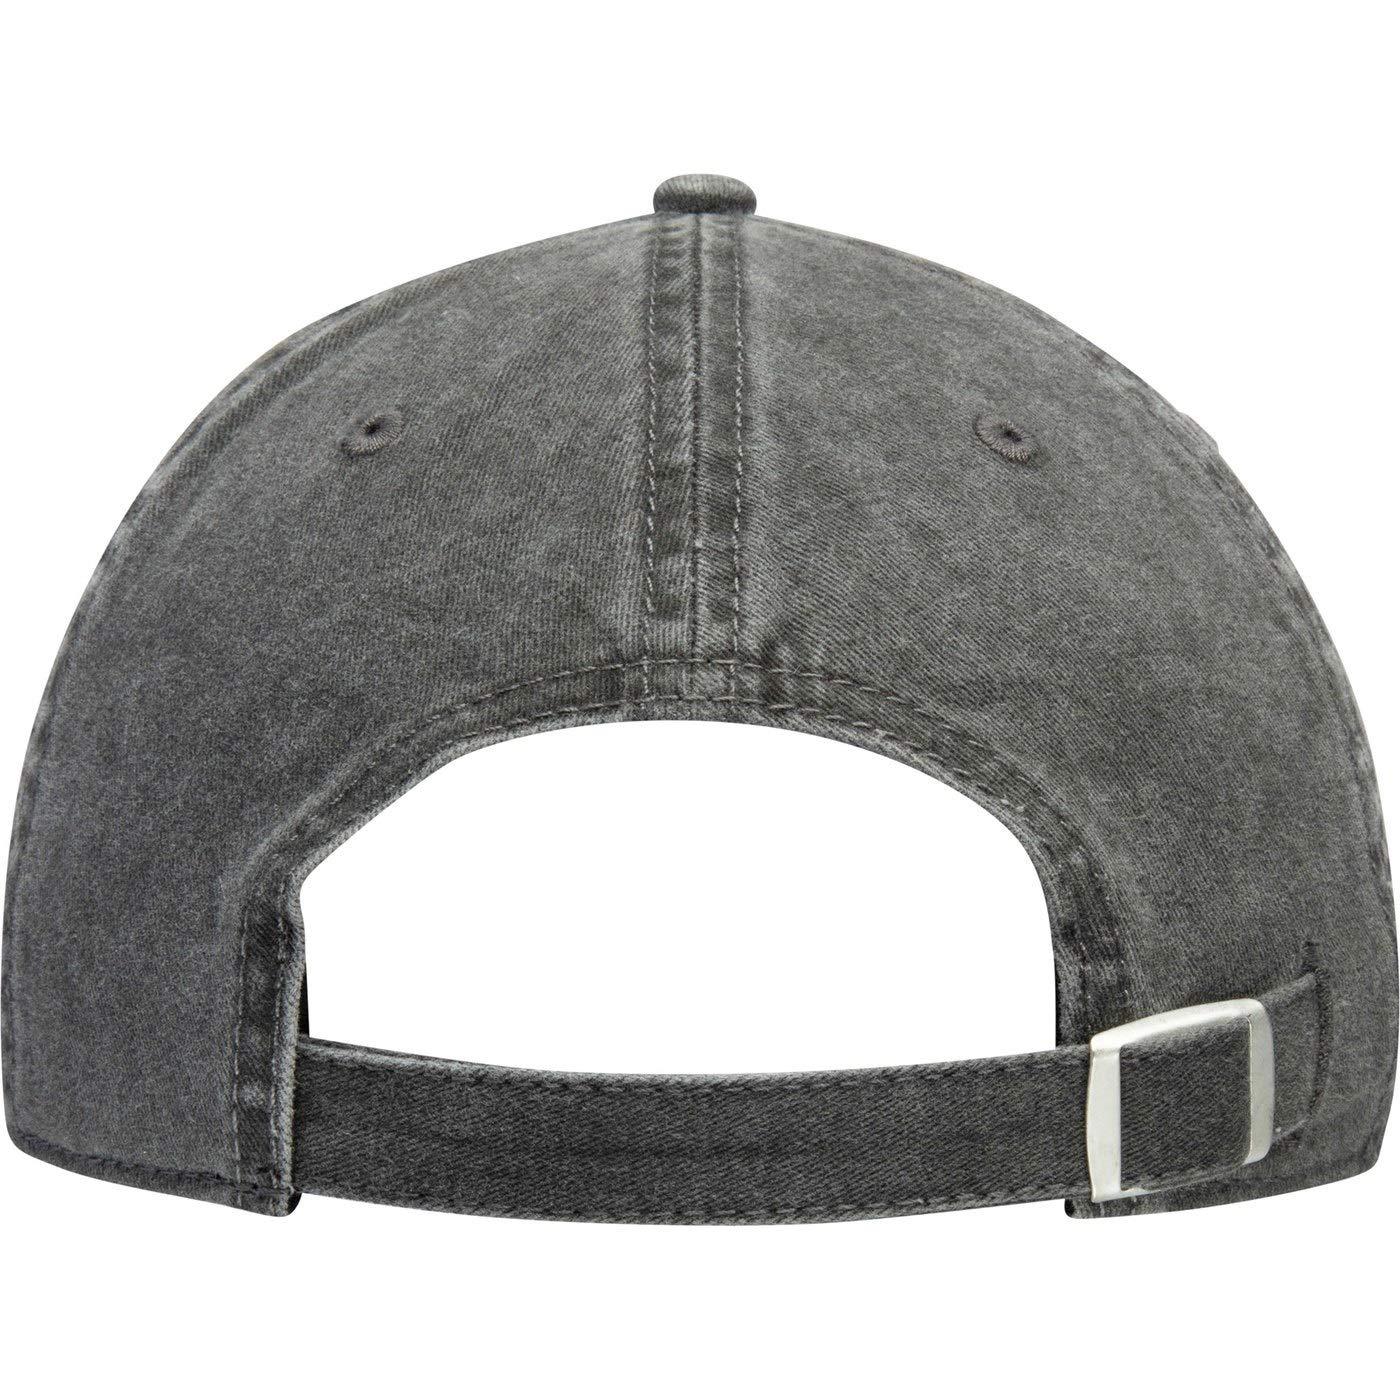 American Needle Chicago Blackhawks Iconic Distressed Adjustable Hat